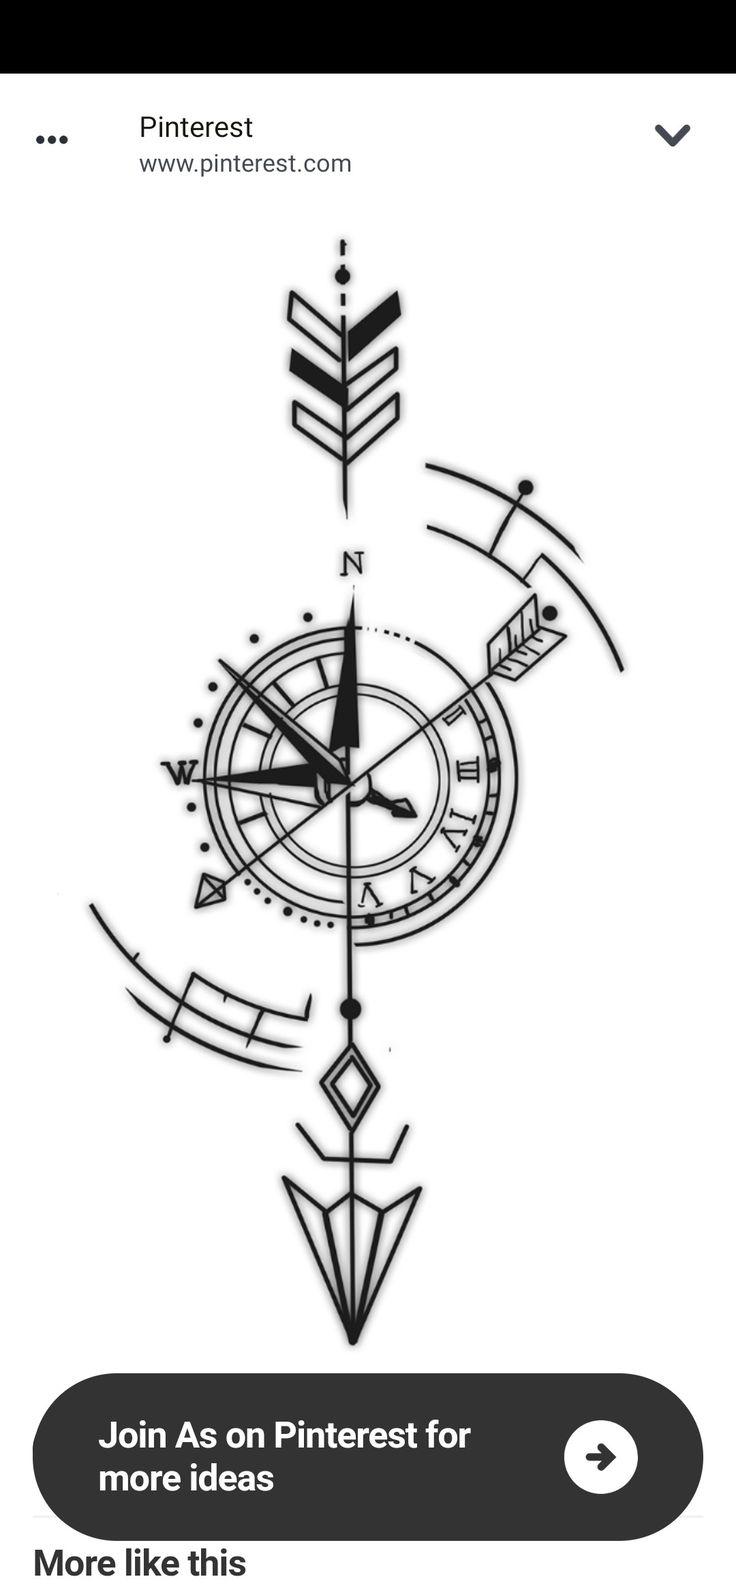 Viking Compass Tattoo, Mandala Compass Tattoo, Simple Compass Tattoo, Arrow Compass Tattoo, Compass Tattoo Design, Geometric Compass, Geometric Wolf Tattoo, Geometric Tattoo Design, Arrow Tattoos For Women